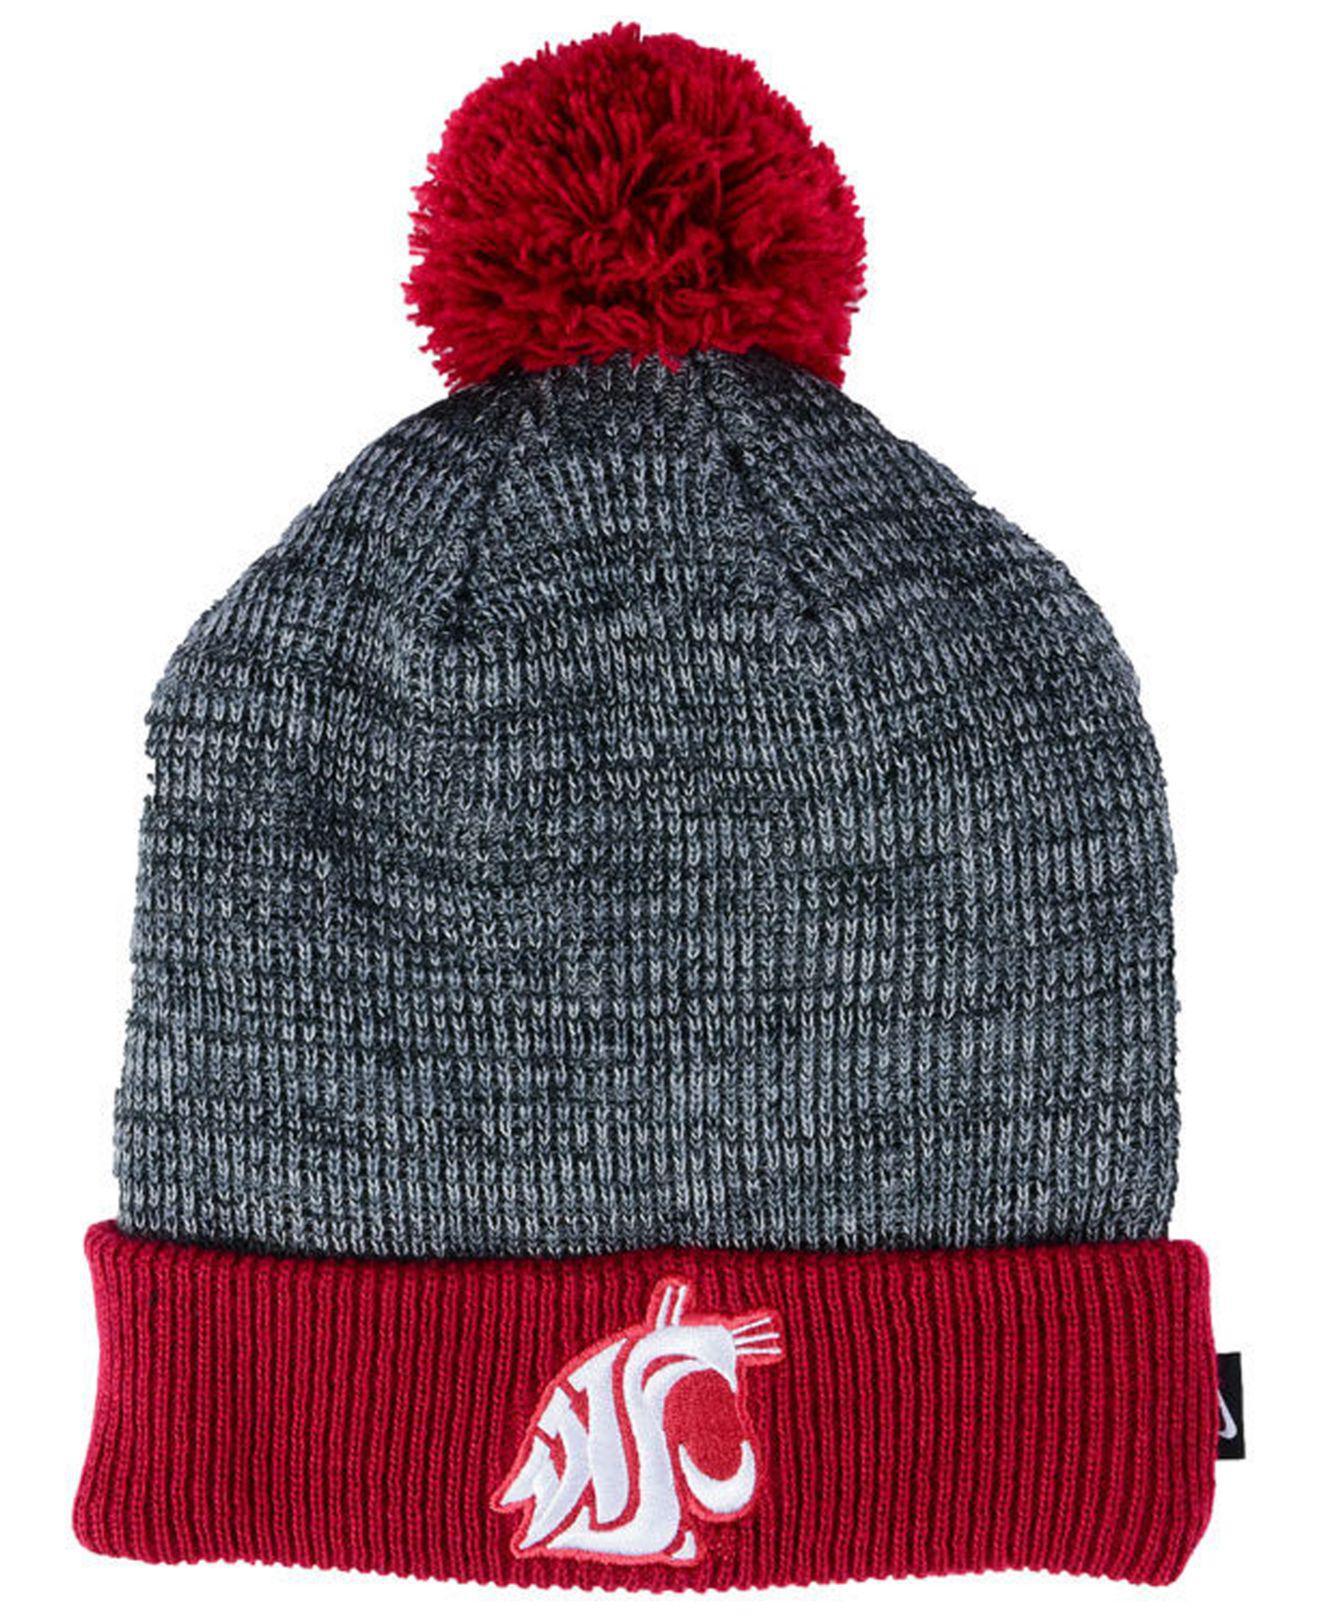 8c2313a915f Lyst - Nike Heather Pom Knit Hat